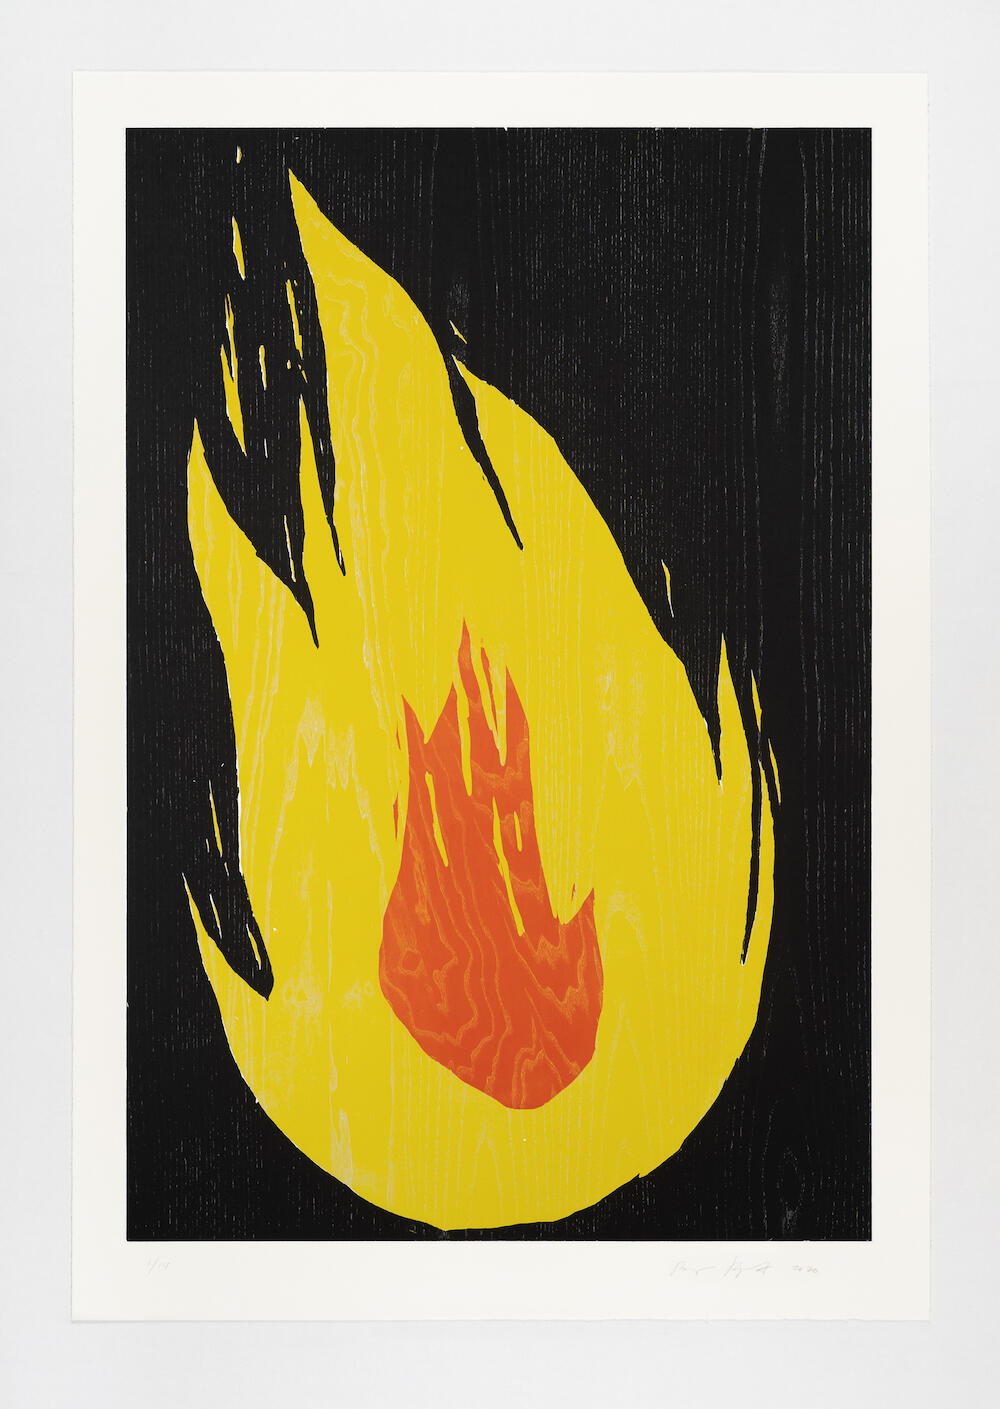 Ragnar Kjartansson, Fire 2, 2020,from the portfolio Fire,woodcut,135 x 93 cm